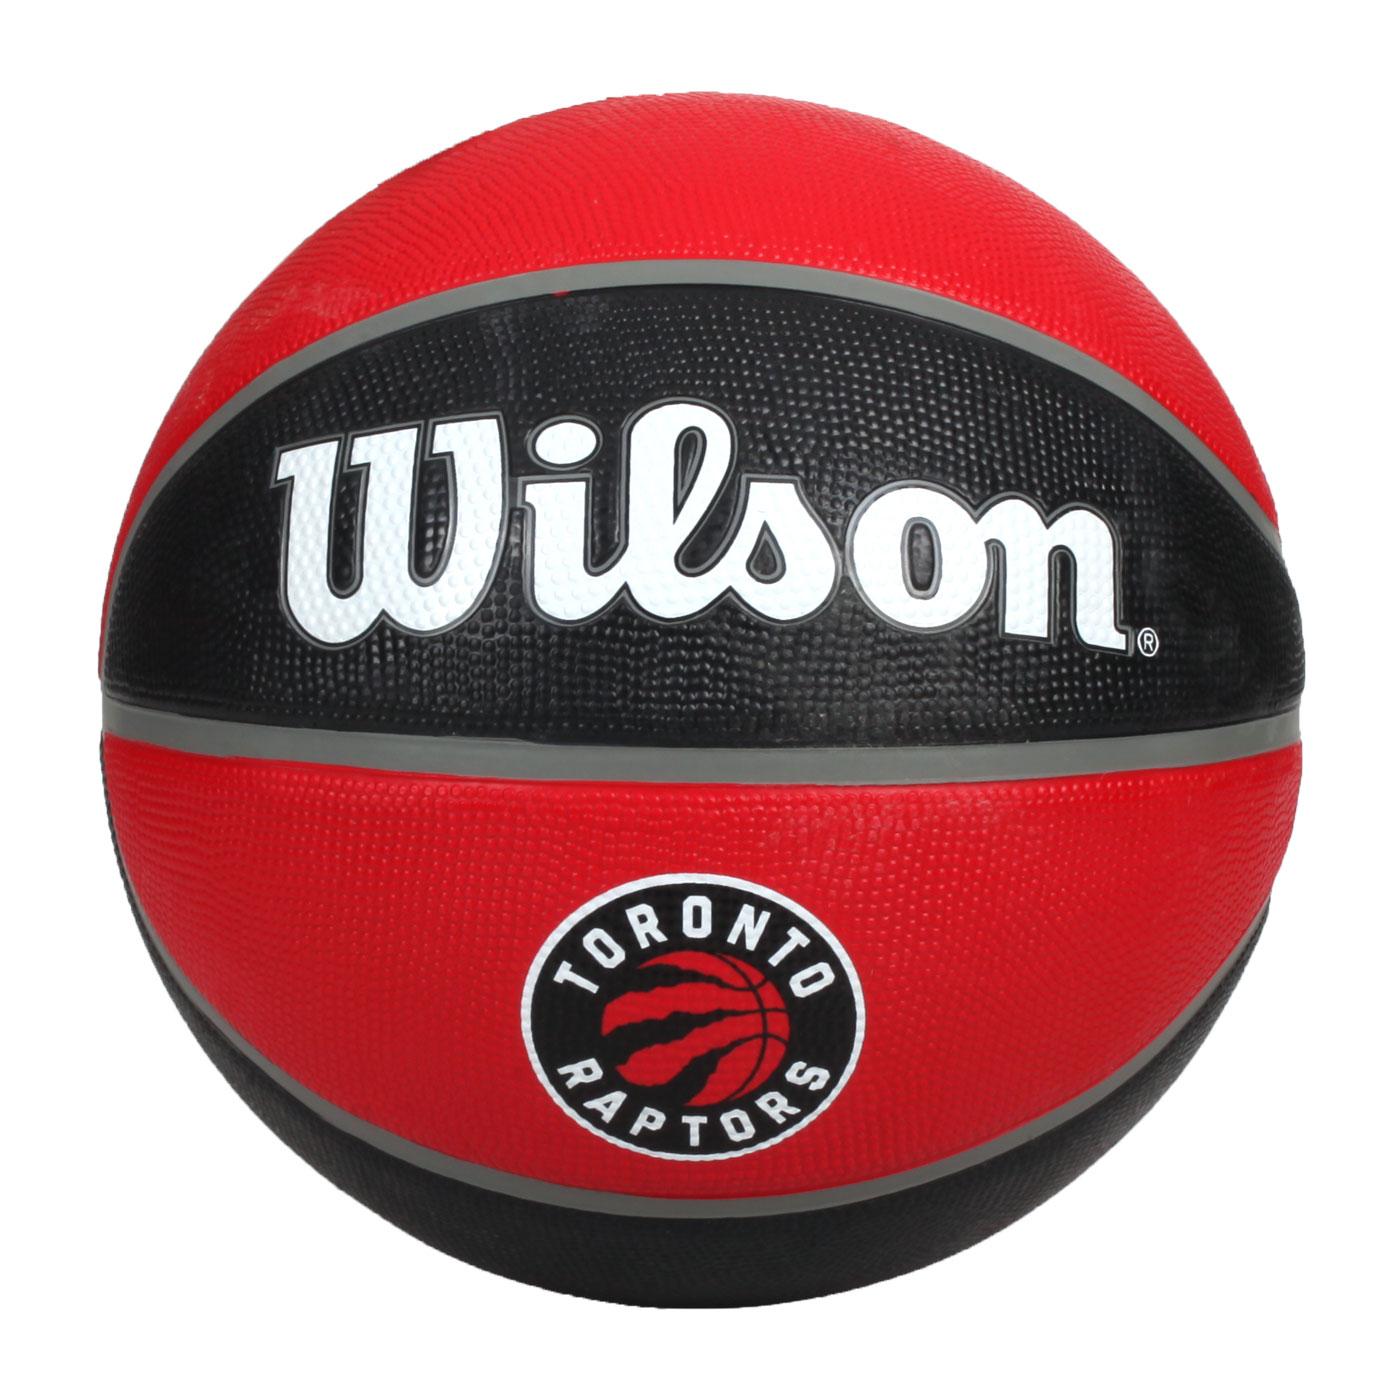 WILSON NBA隊徽系列 暴龍隊橡膠籃球#7 WTB1300XBTOR - 紅黑白